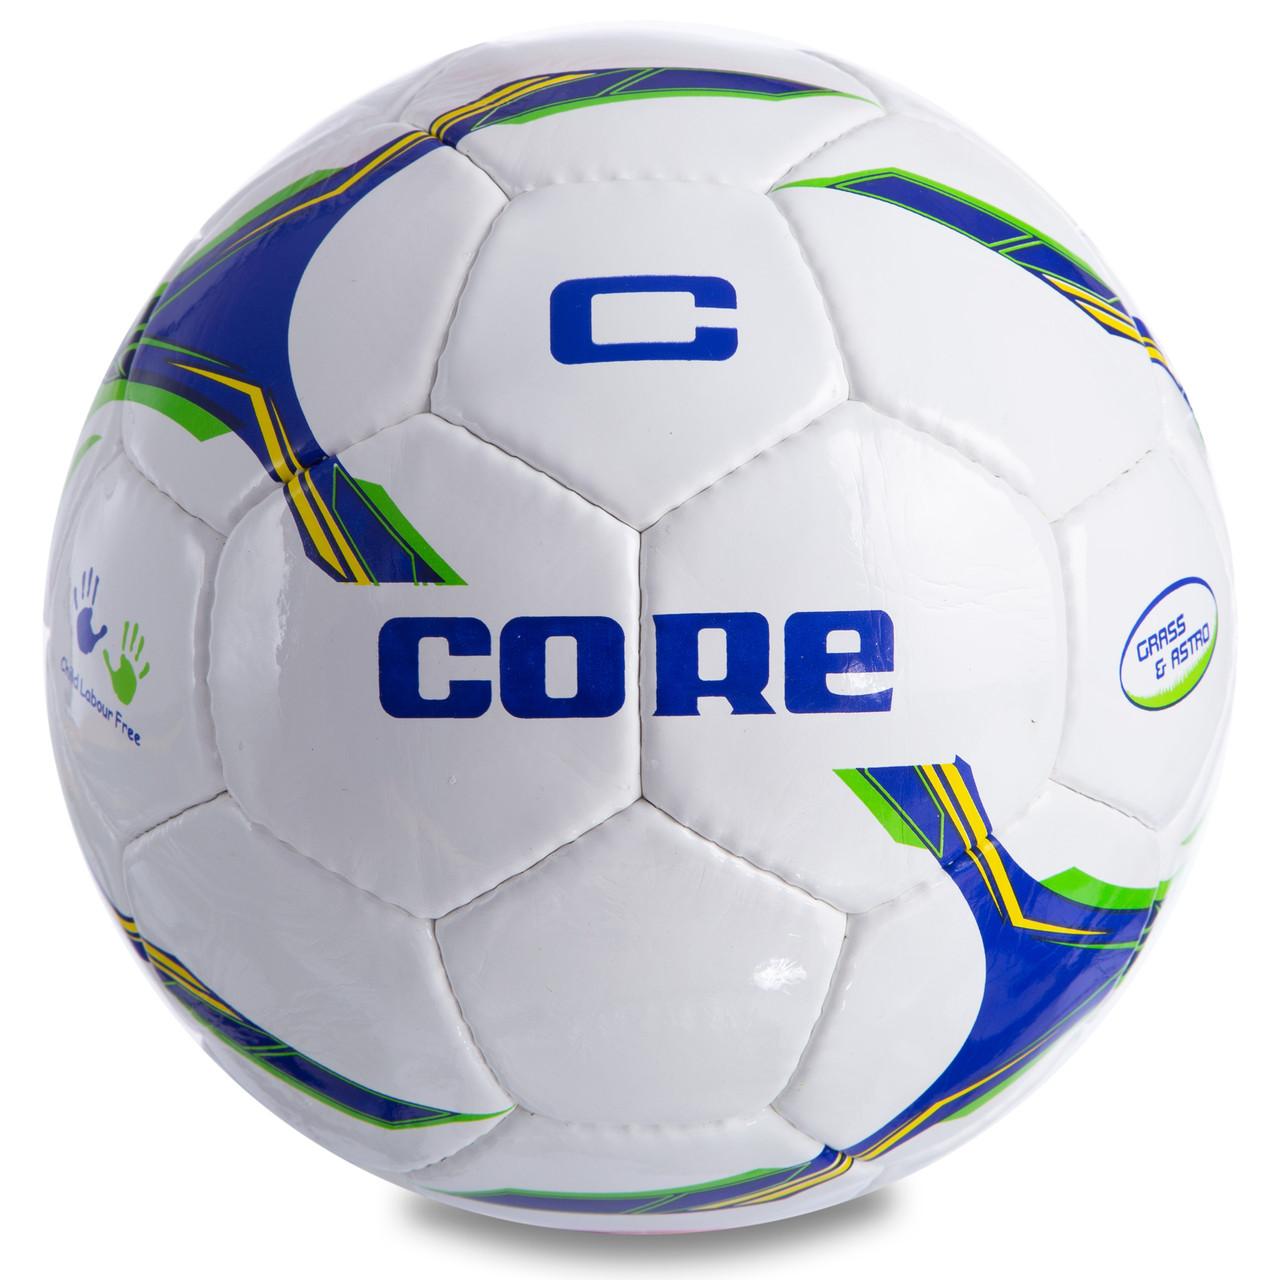 М'яч футбольний №5 PU SHINY CORE FIGHTER